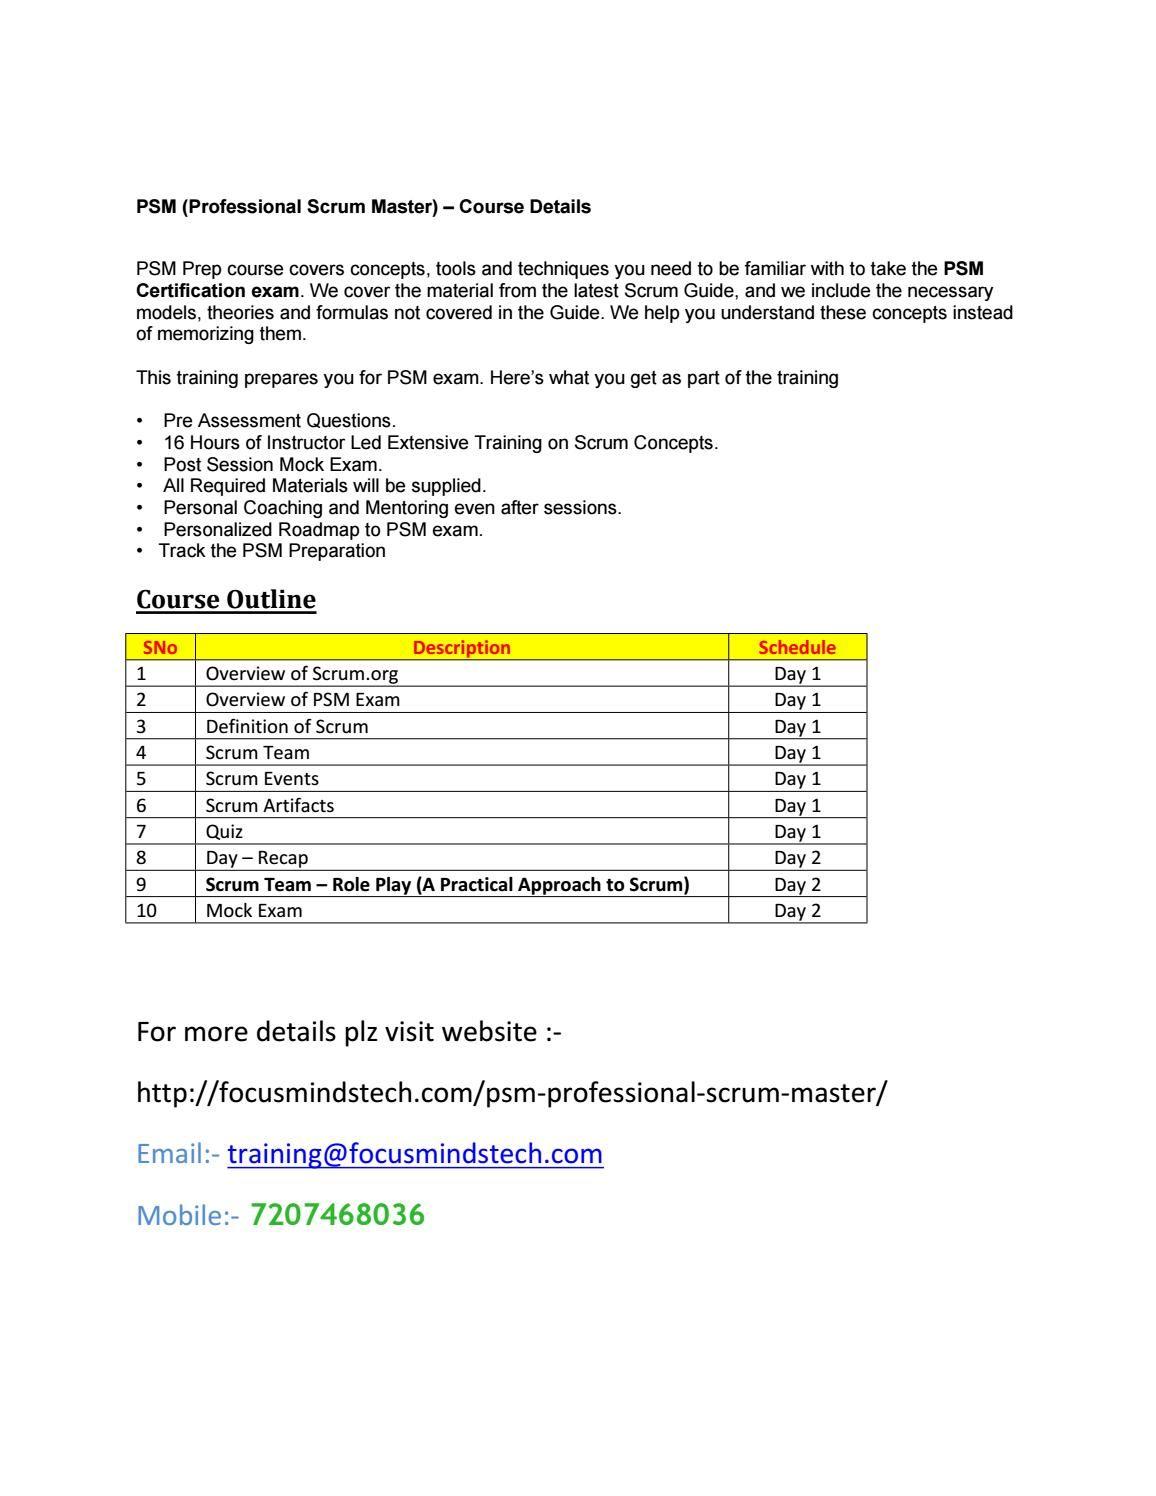 Professional Scrum Master Psm Certification Training In Hyderabad